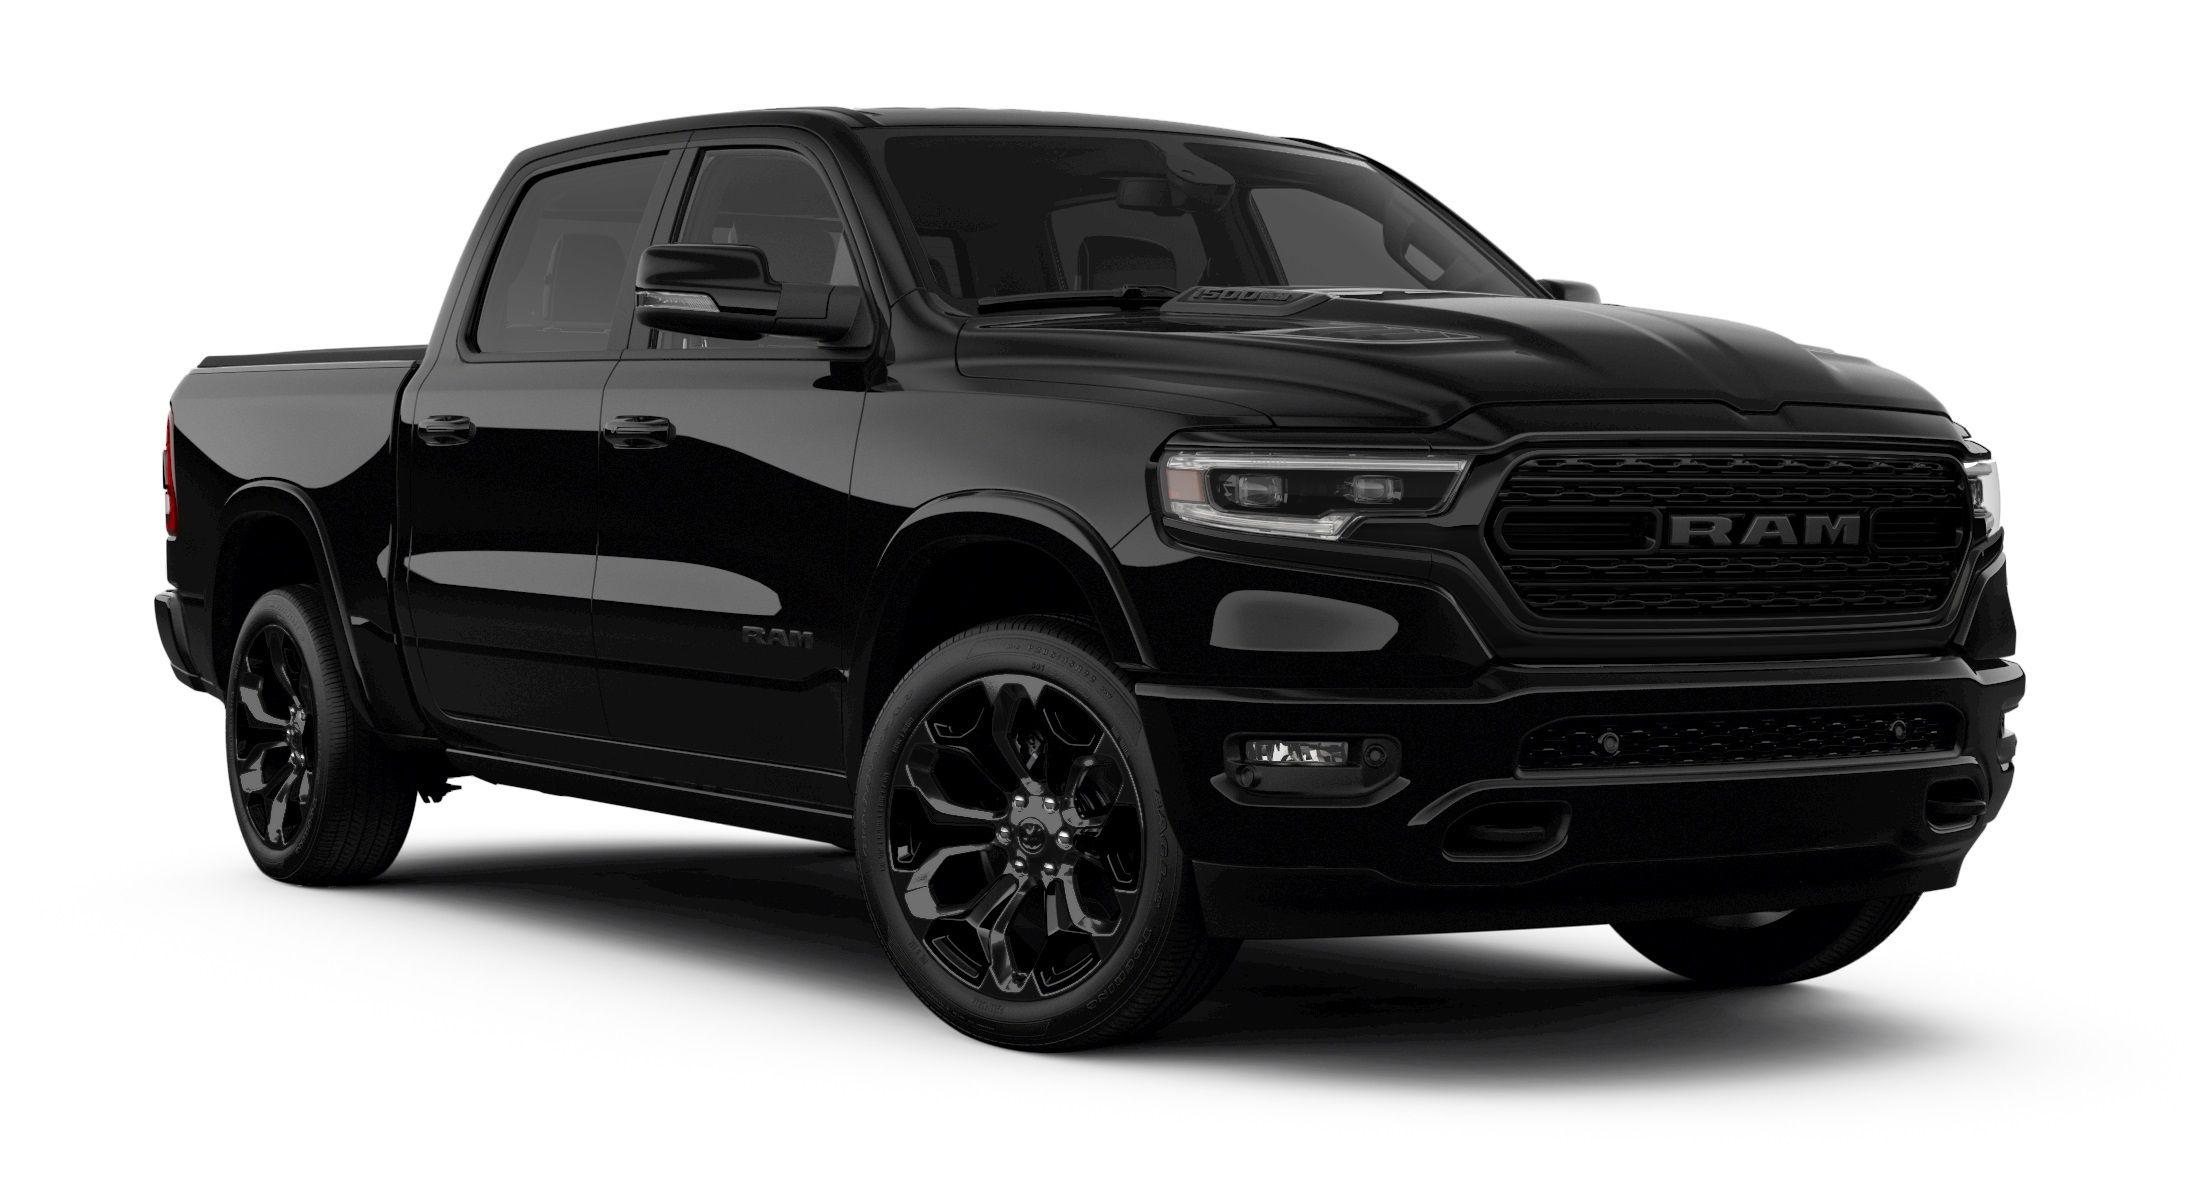 Yes I M Back In Black Ram Debuts Limited Black Edition Gas Monkey Garage Richard Rawlings Fast N Loud Ram Trucks Black Truck Ram 1500